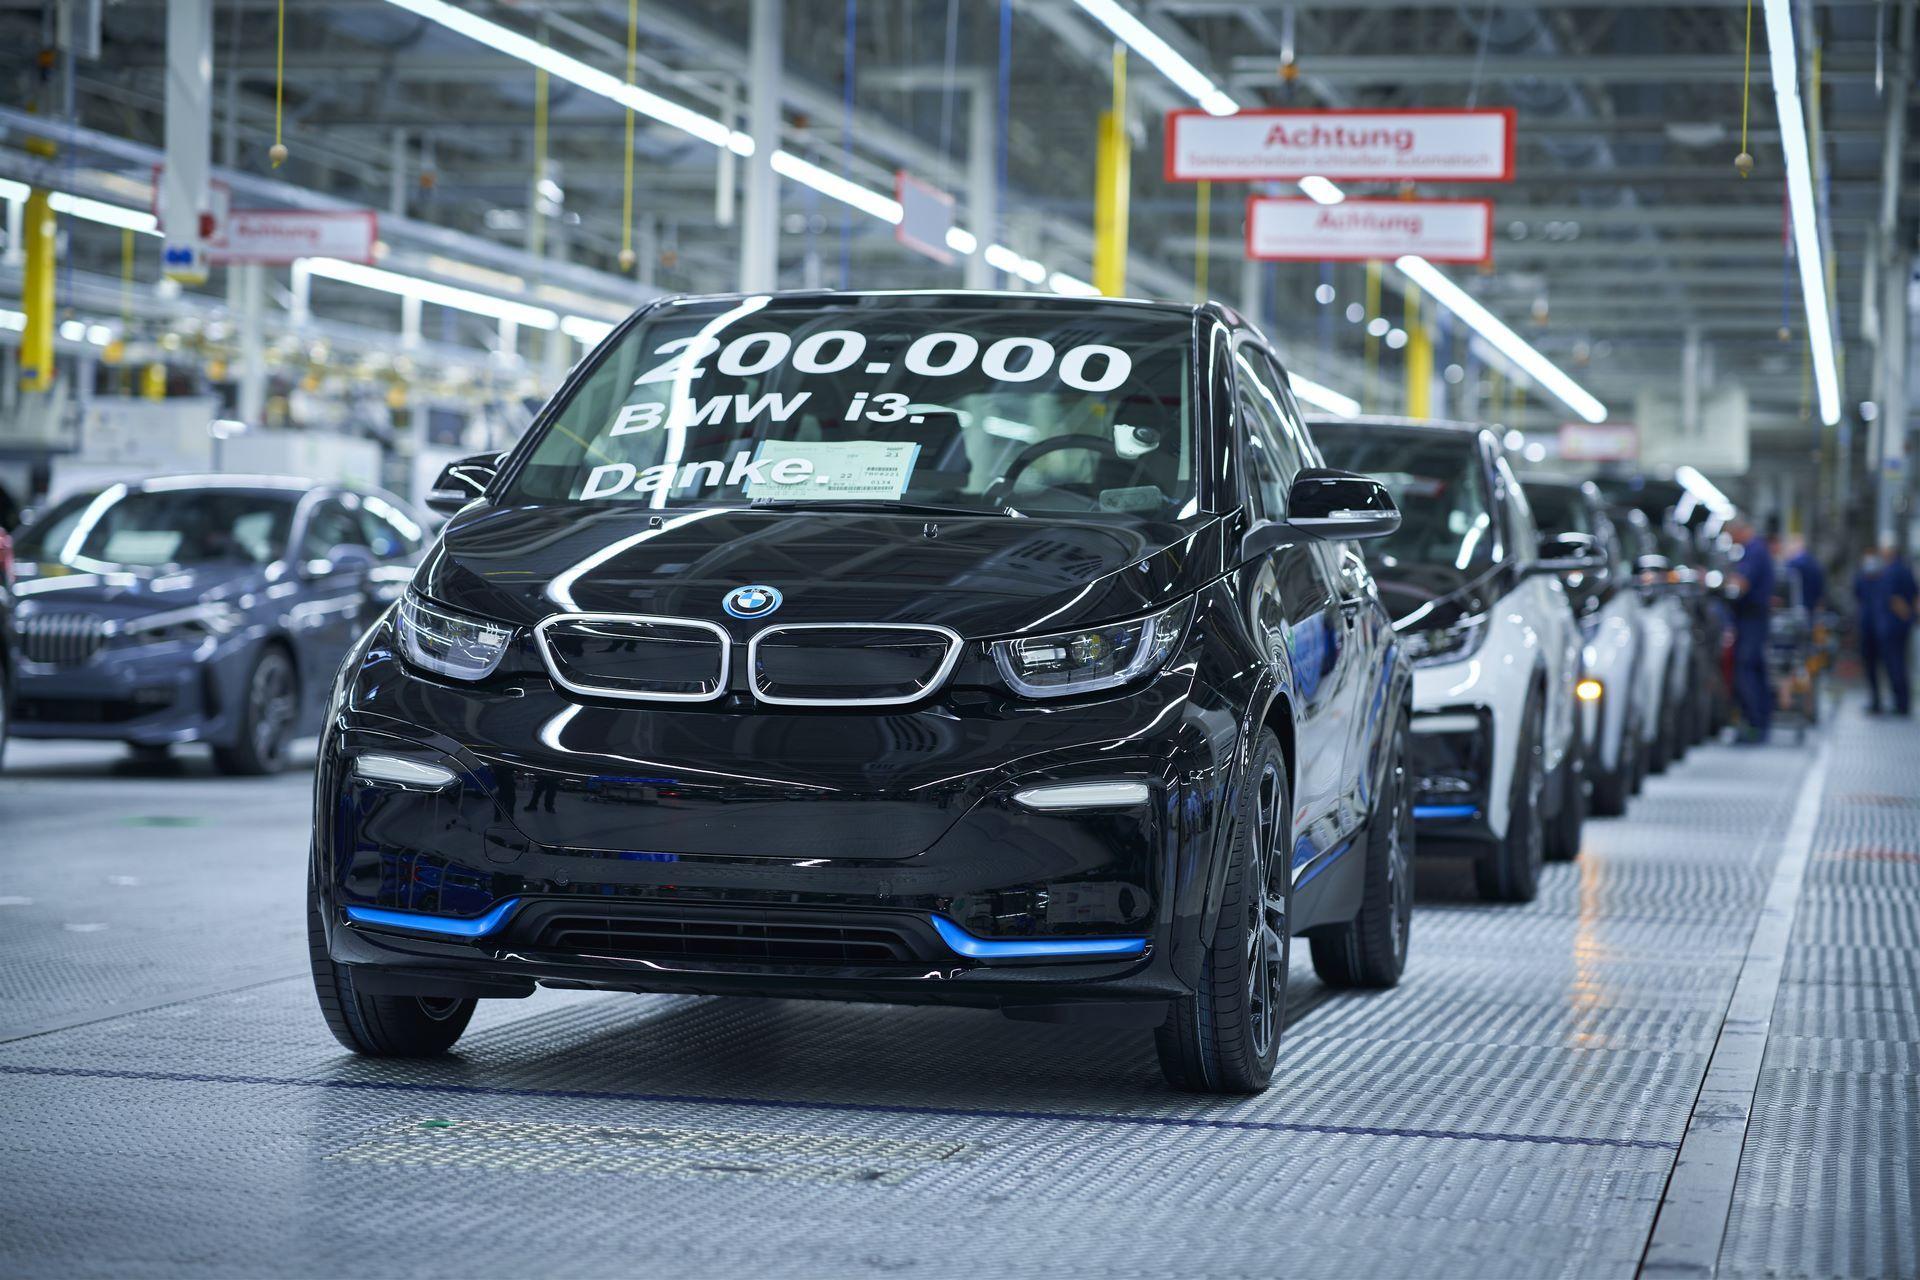 BMW-i8-plant-production-48